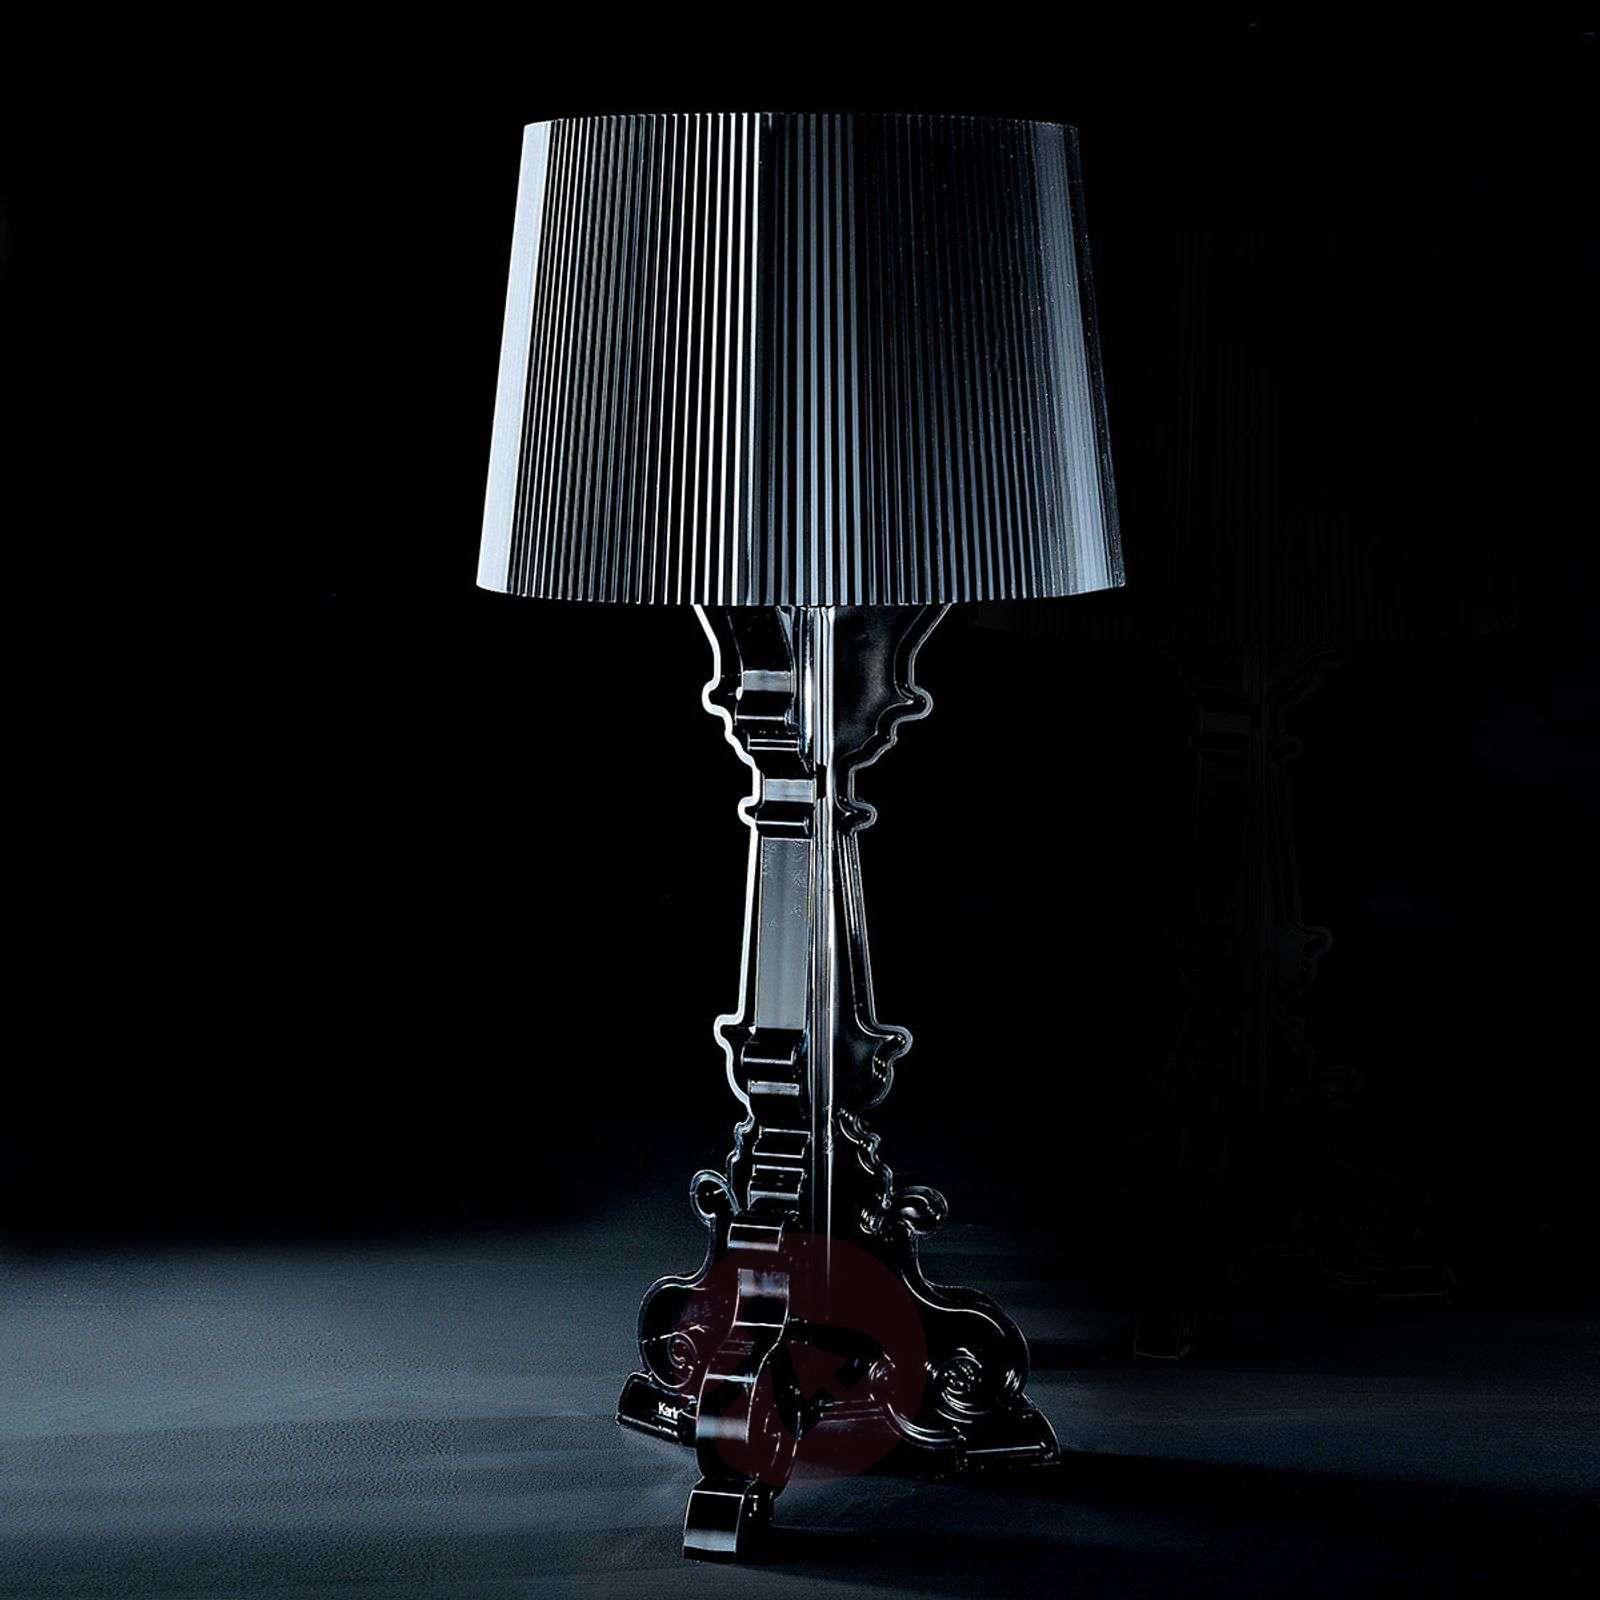 Design-LED-pöytävalaisin Bourgie-5541027X-01